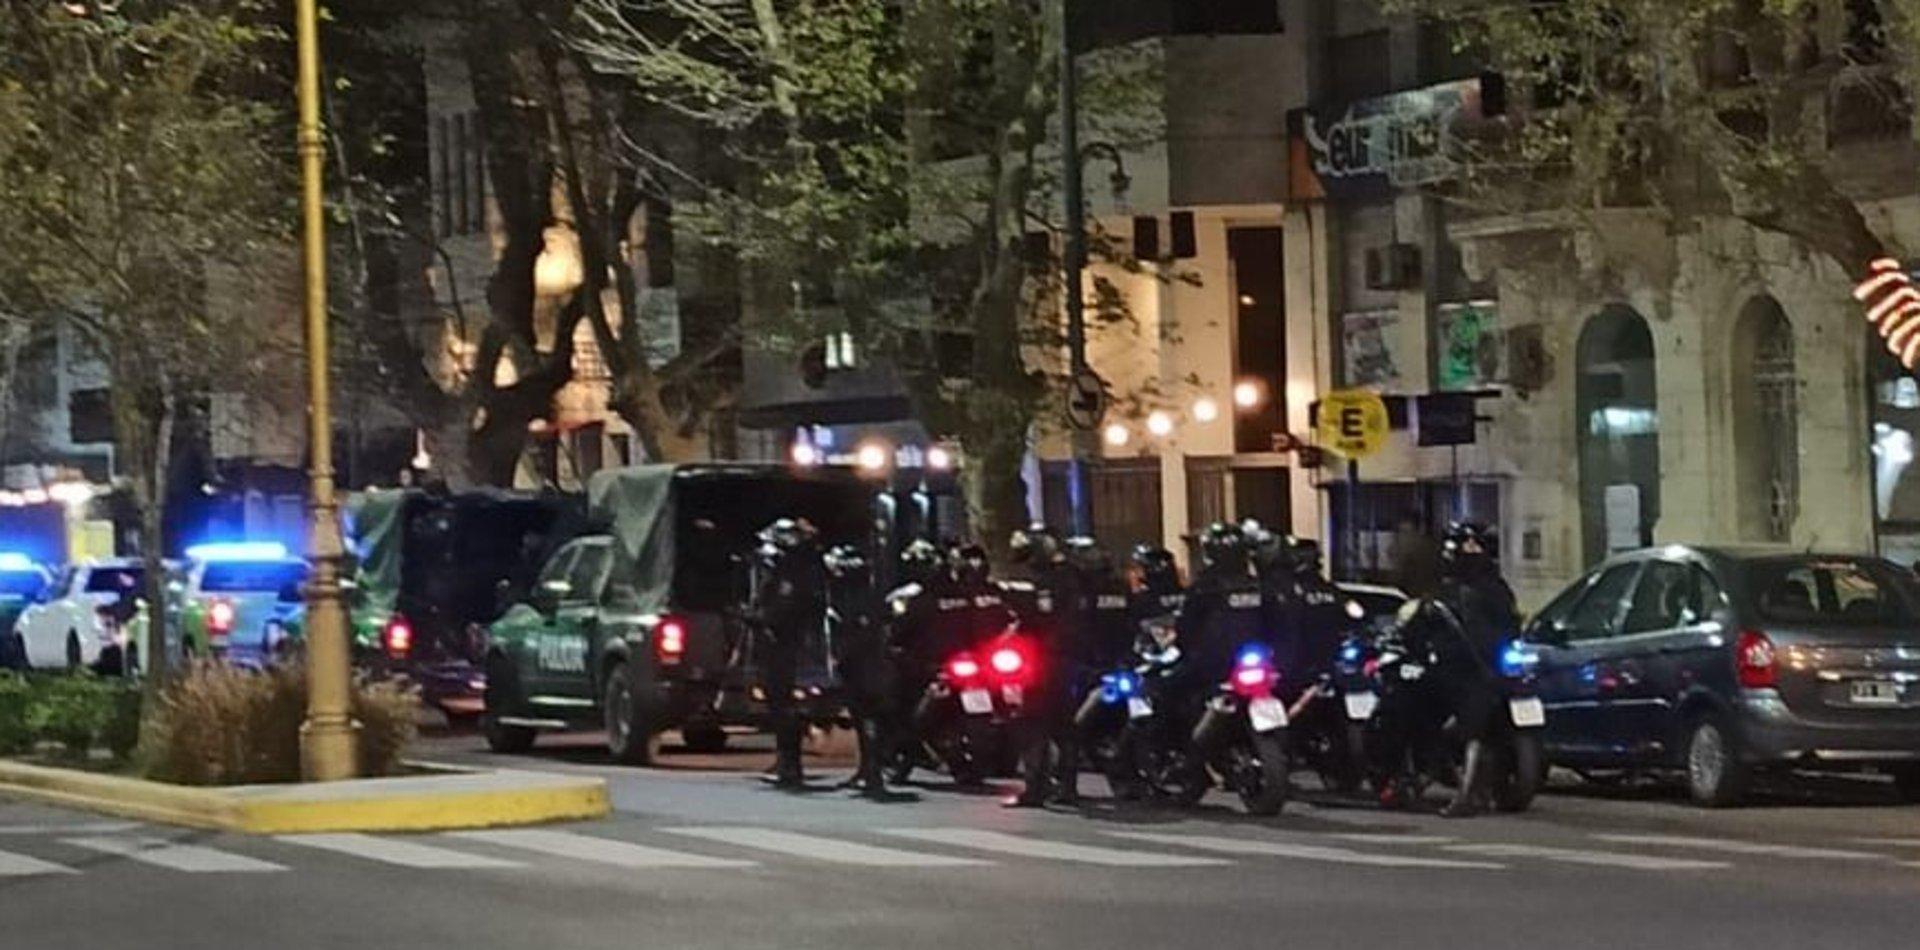 VIDEO: Fuerte operativo policial para sacar las mesas de las cervecerías en diagonal 74